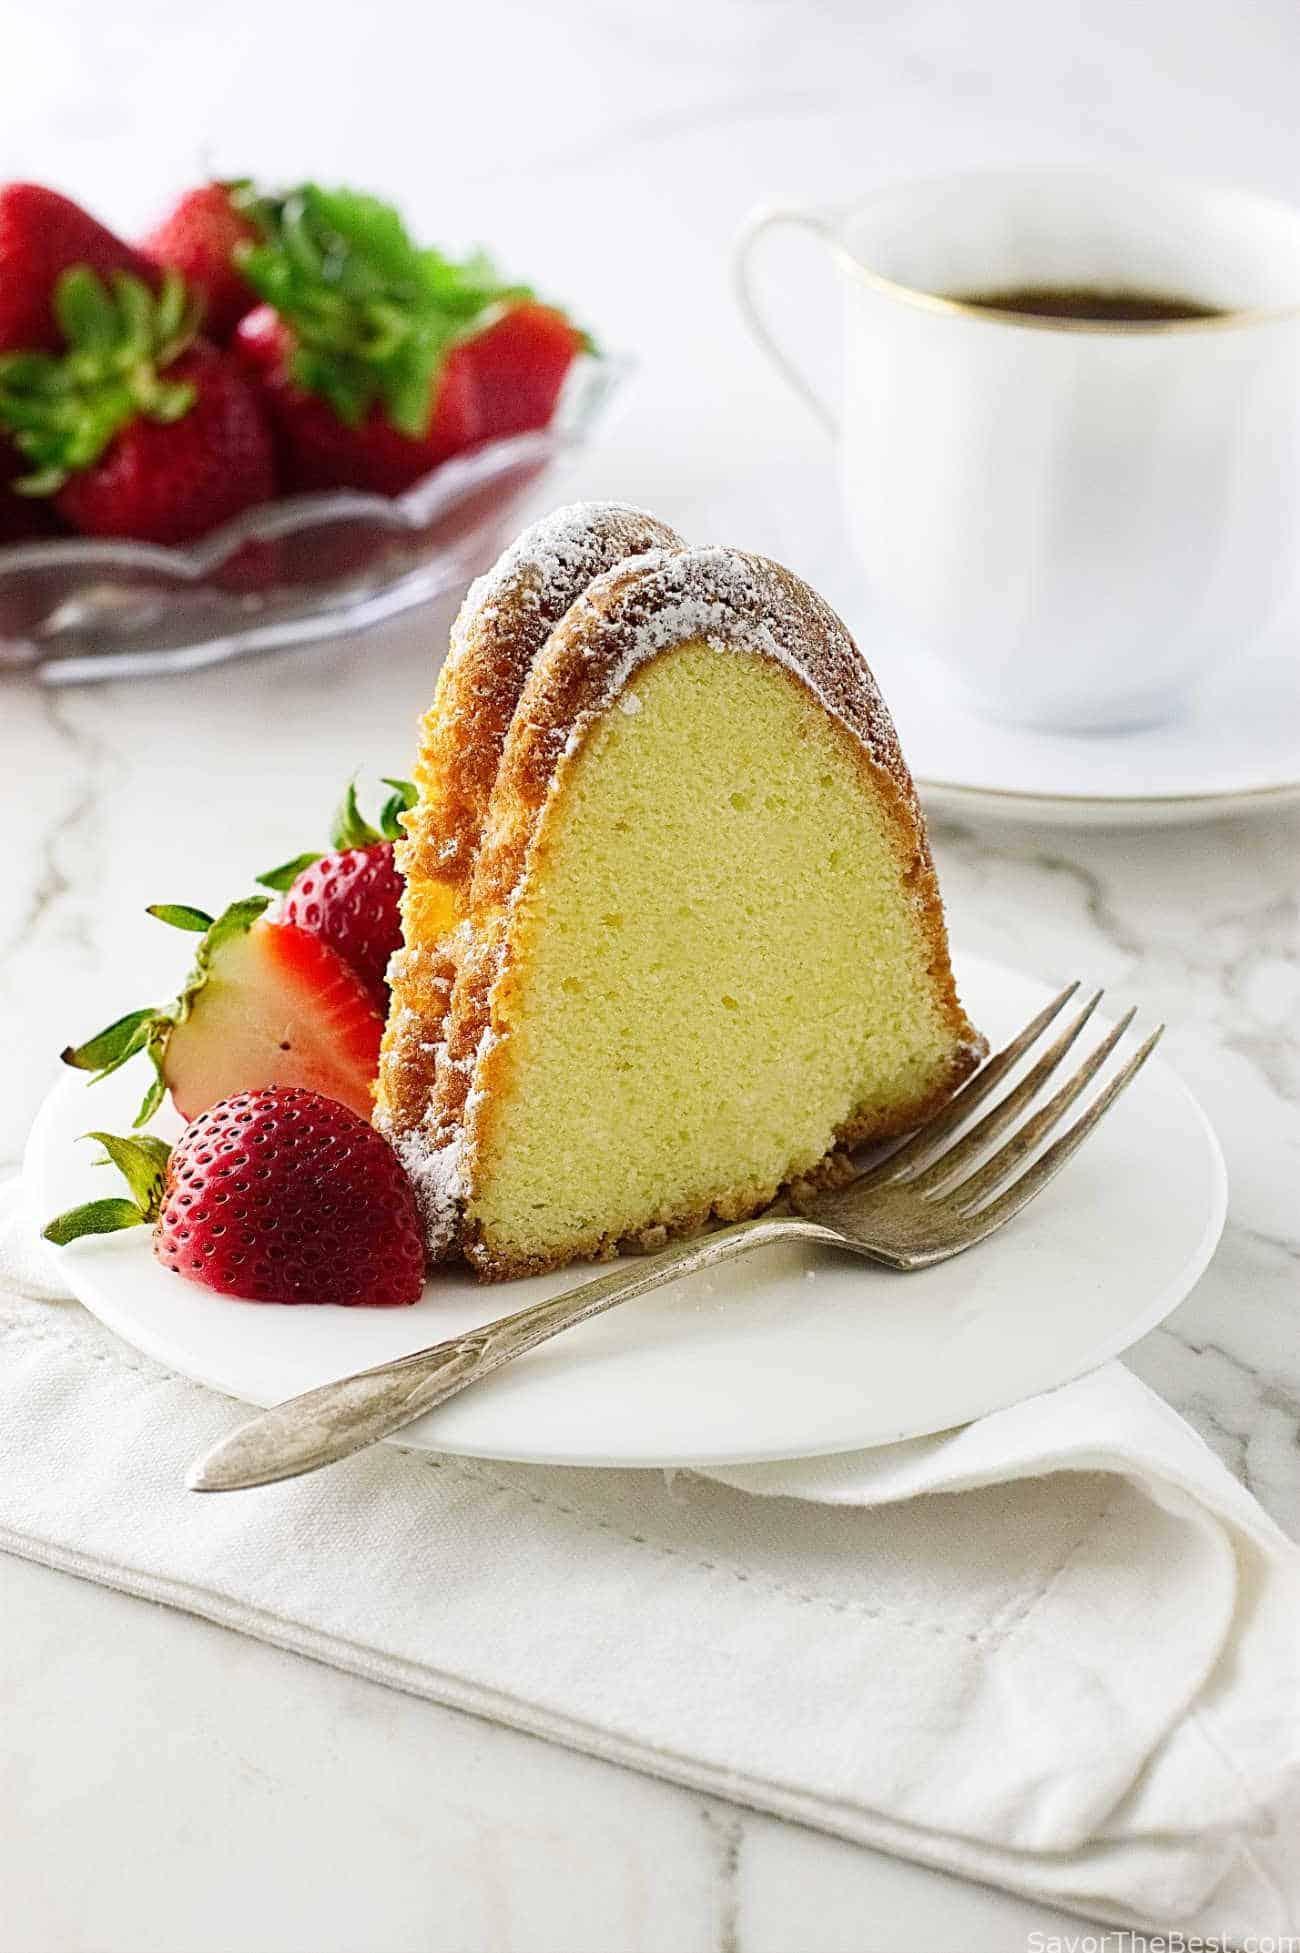 Pound Cake Recipe Without Baking Powder Or Baking Soda